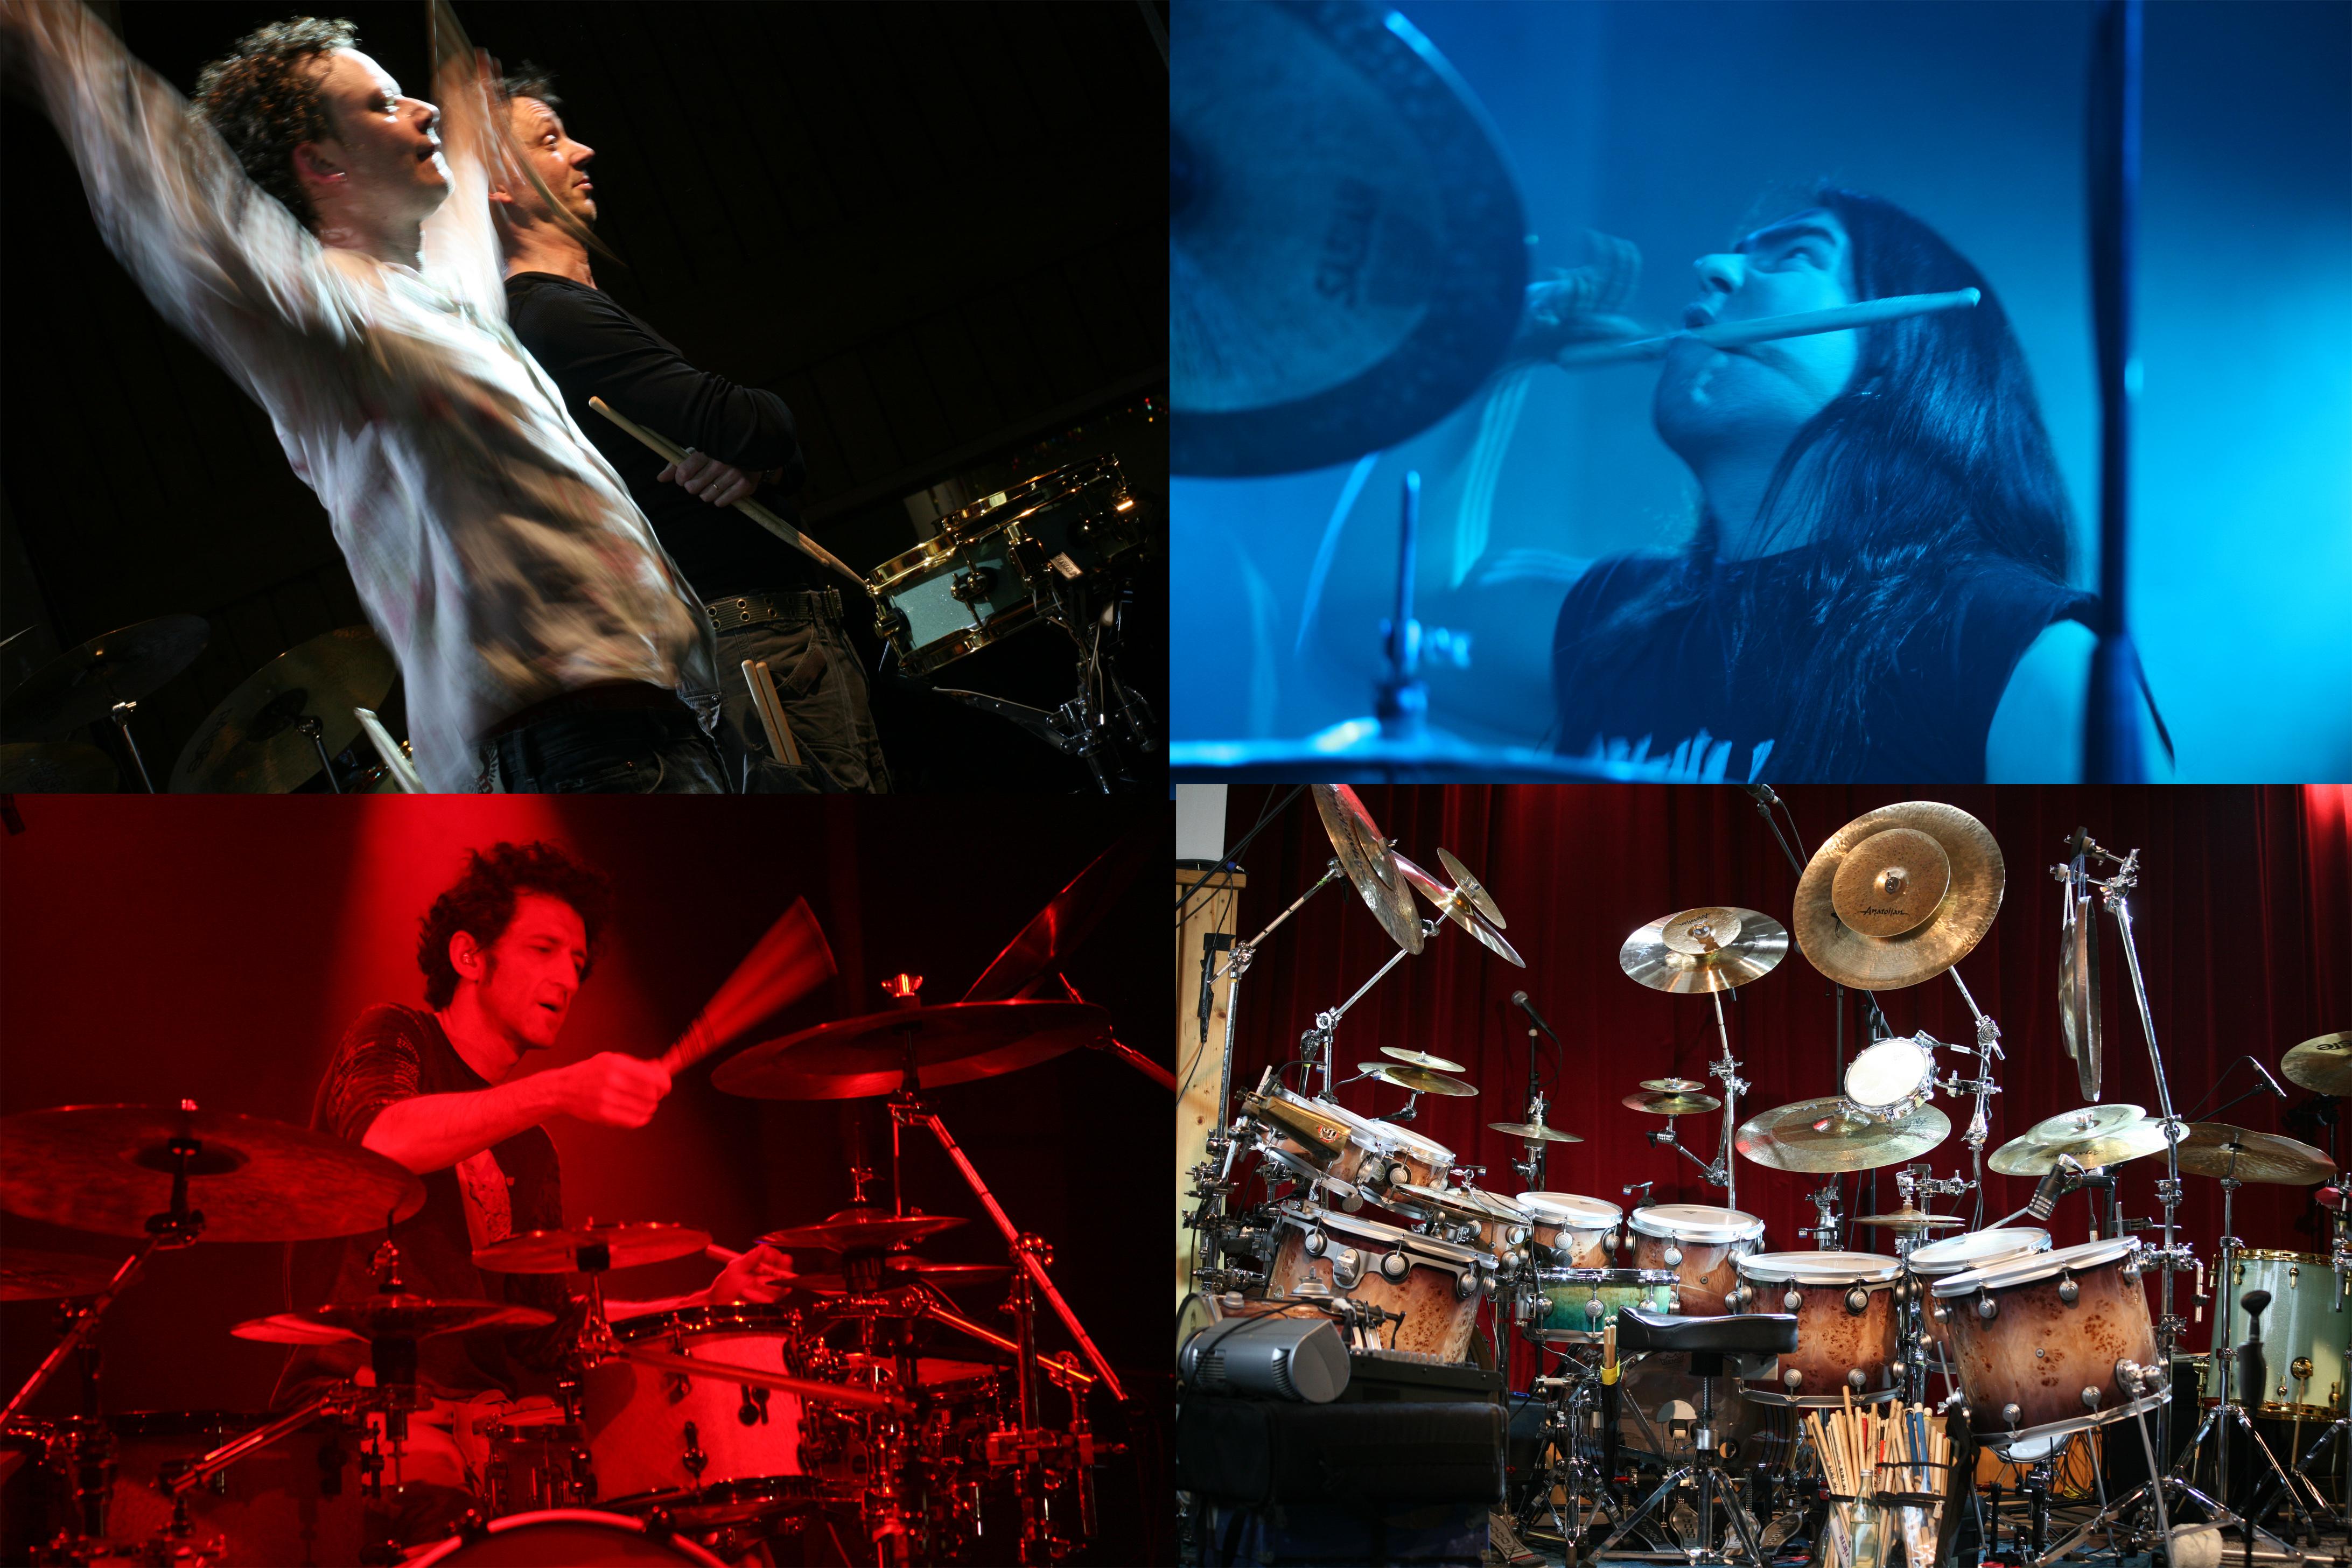 2008: 25-Jahr-Feier mit Jojo Mayer, den Drumbassadors, Stefan Spatz u.v.m.